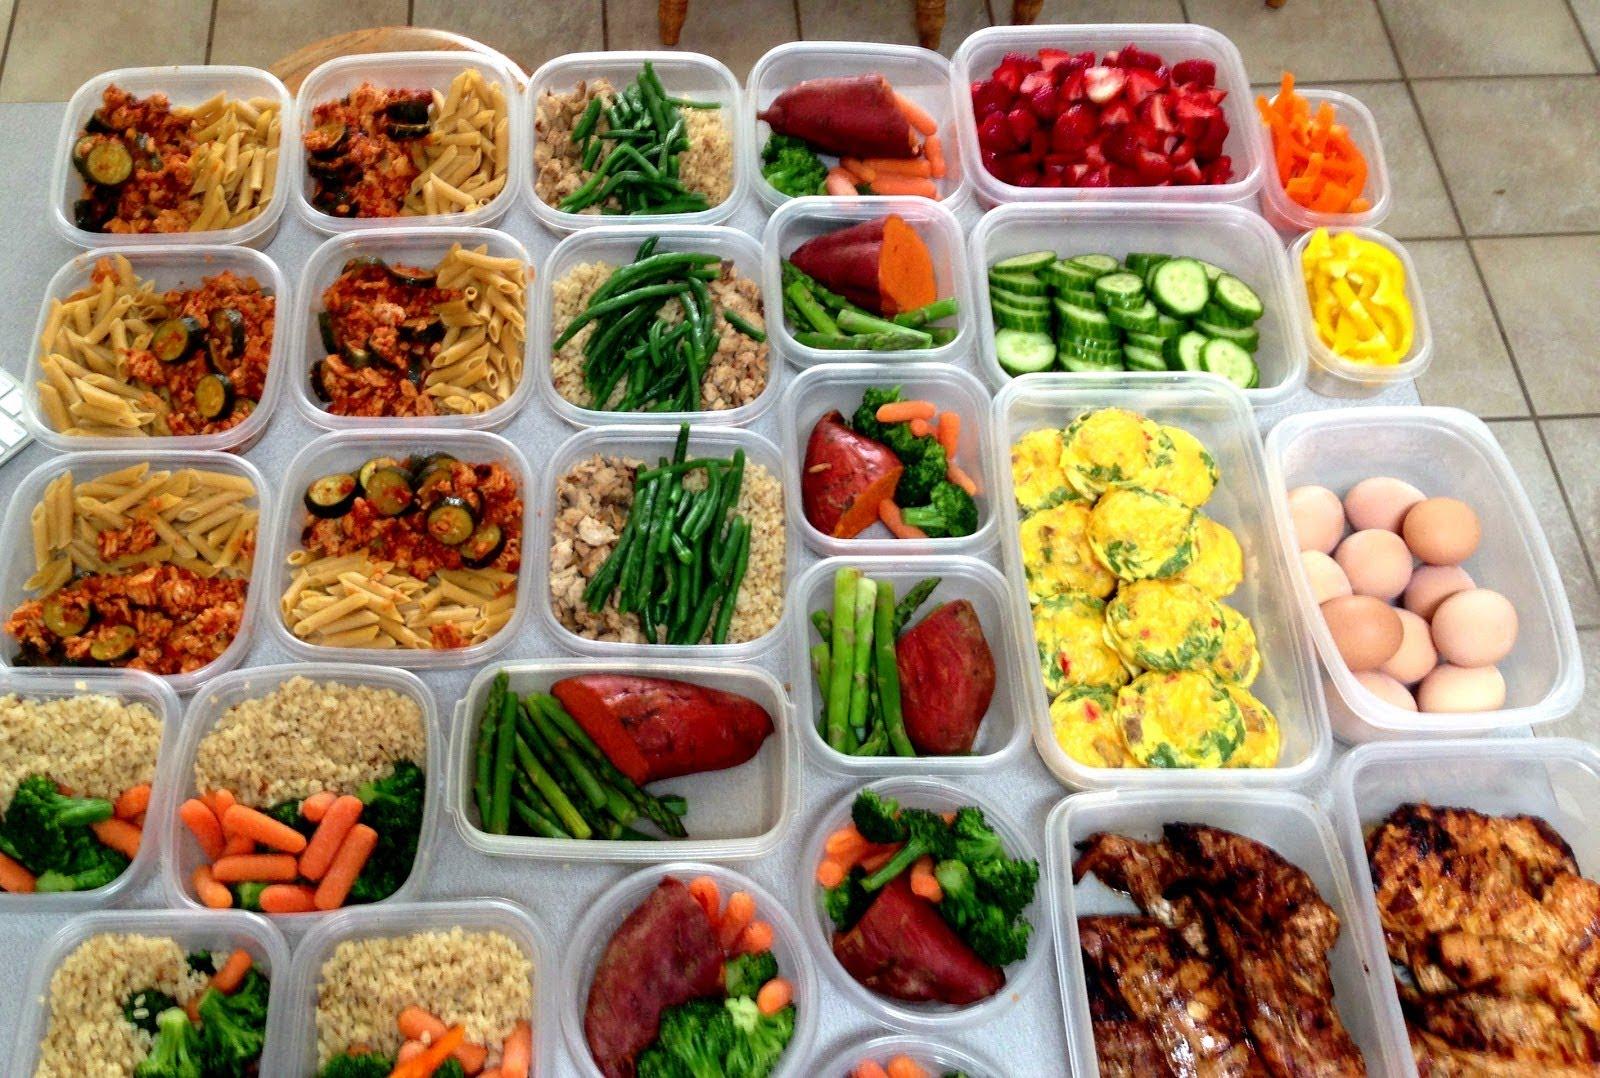 Paleo Diet Plan - 7 Paleo Meal Prep Ideas